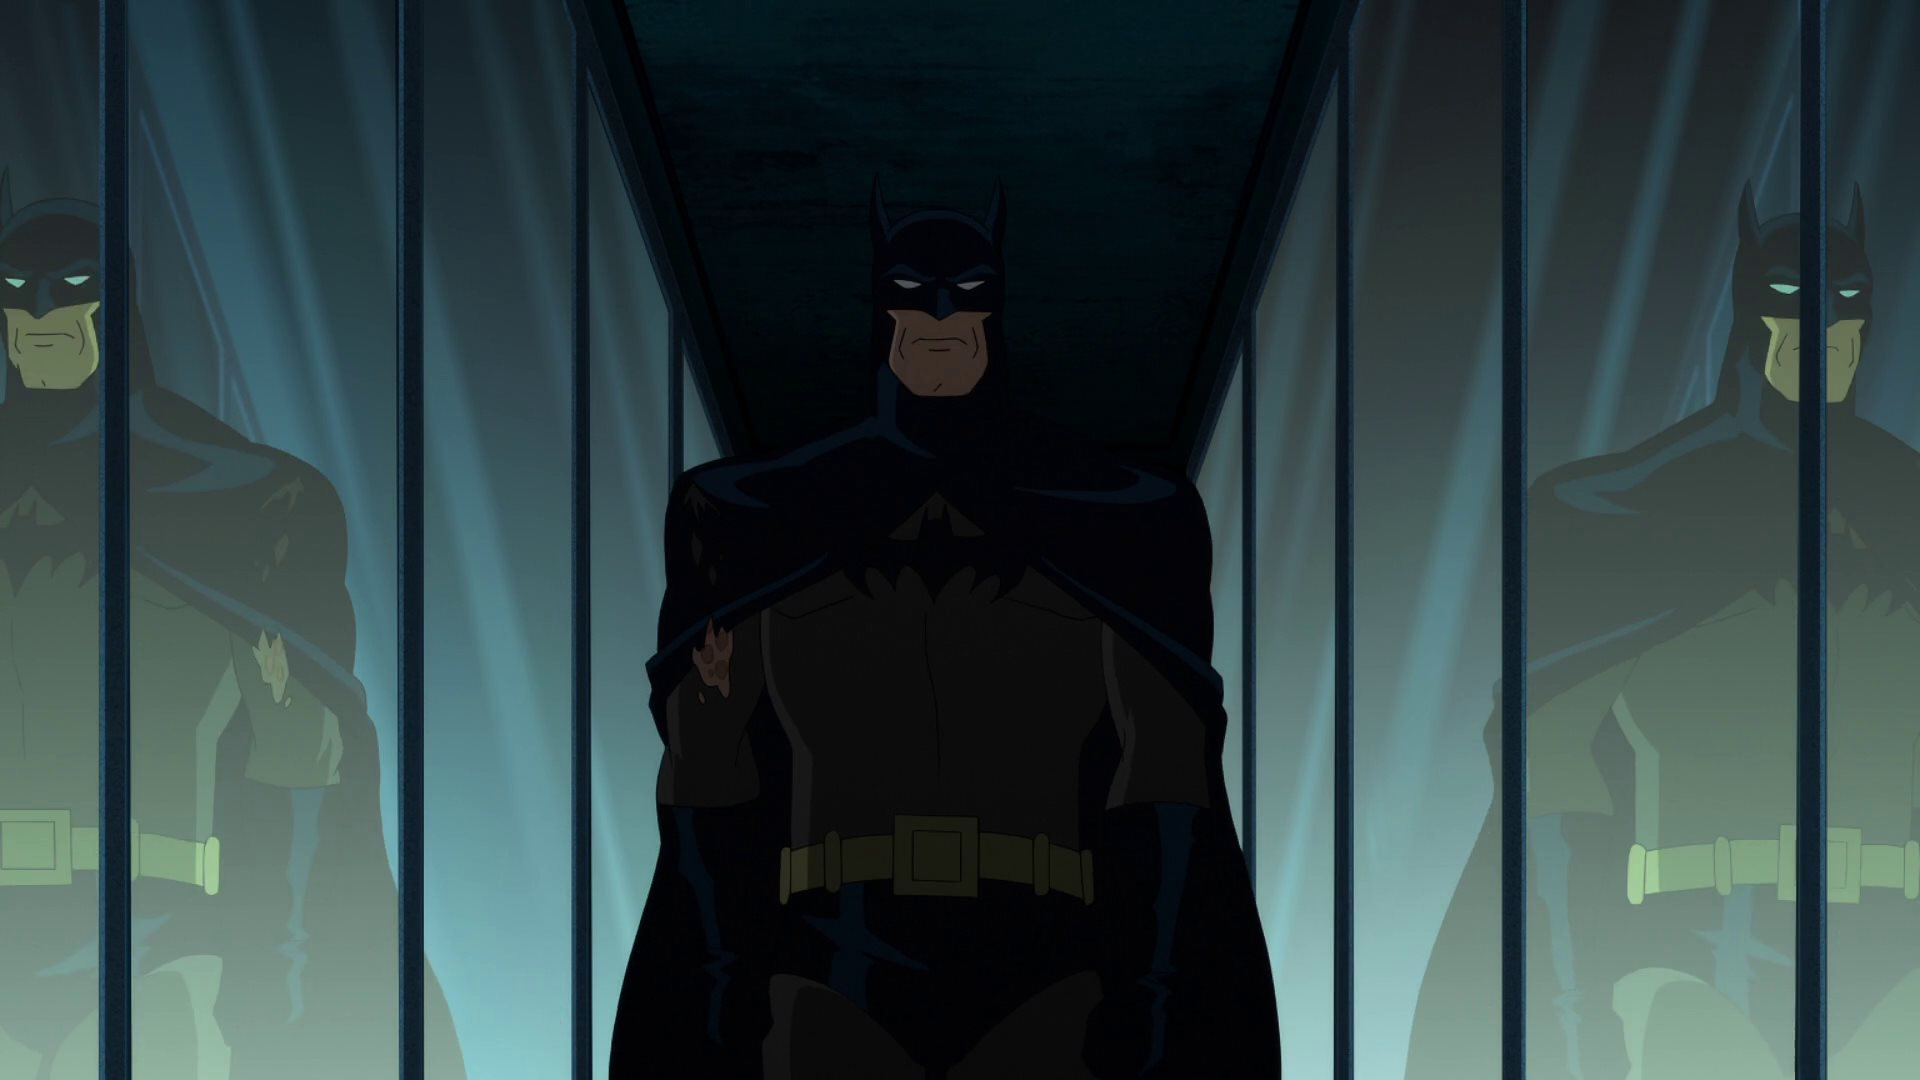 Batman: Öldüren Şaka - Batman: The Killing Joke 2016 BluRay 1080p x264-ROVERS DuaL (TR-EN) Tek Link